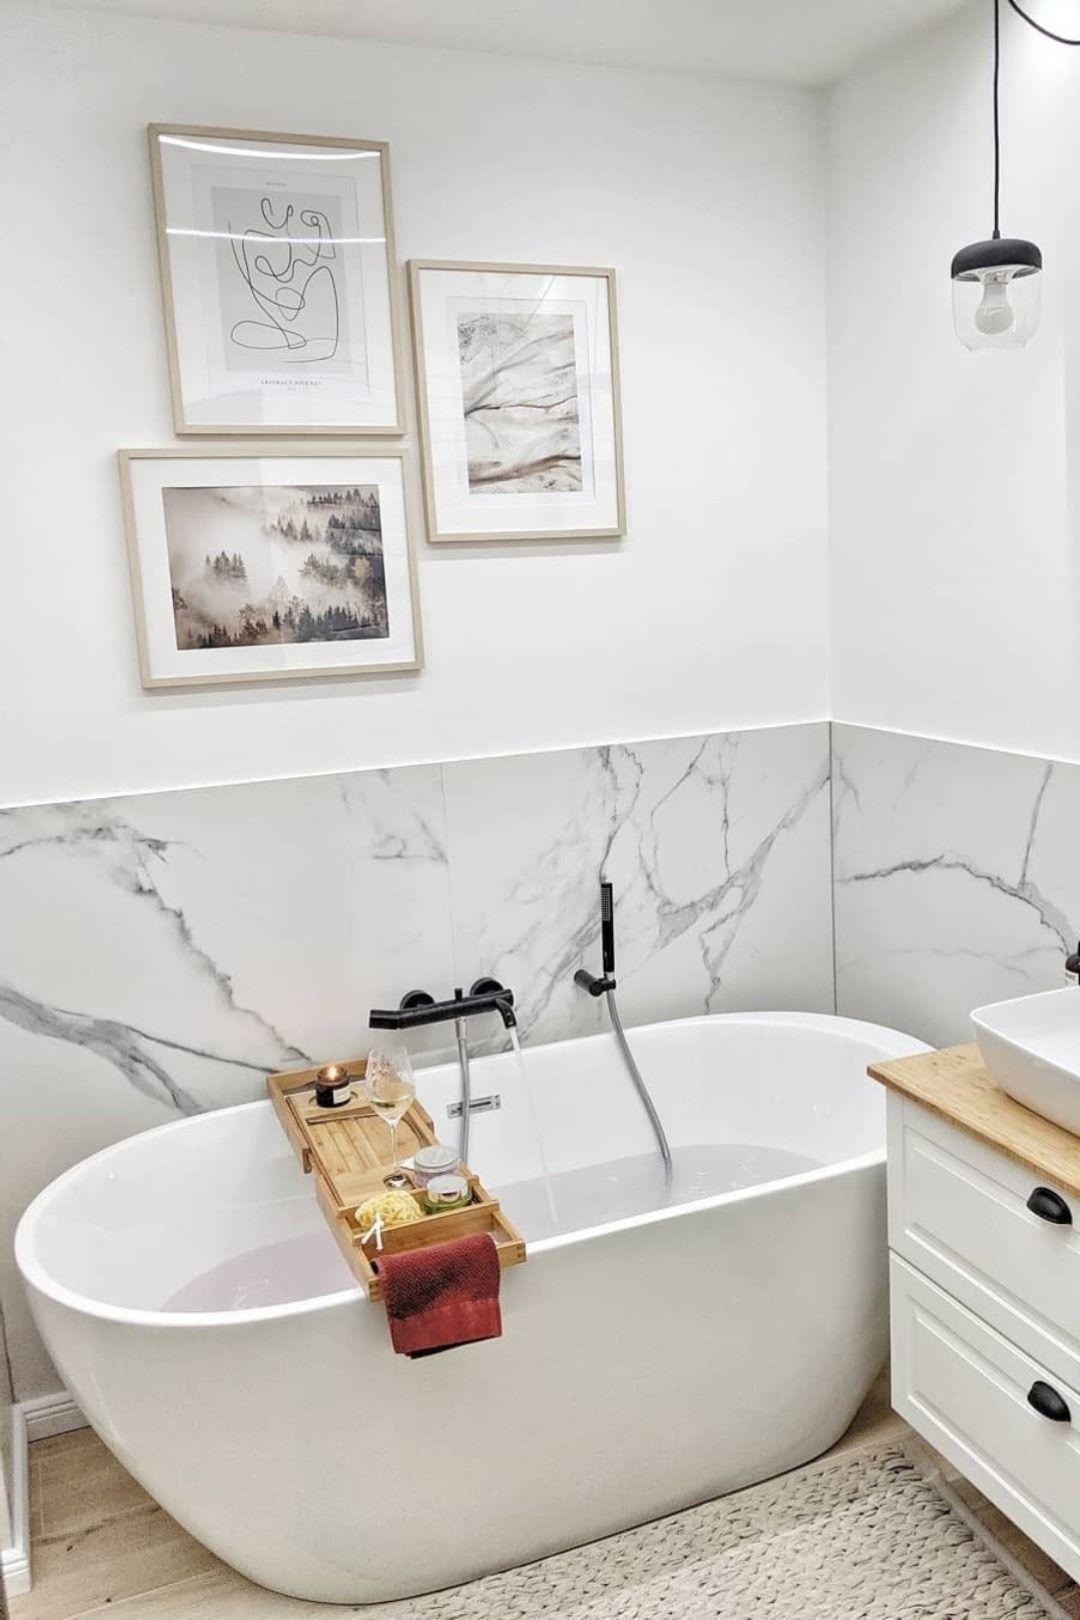 Vasca Da Bagno Freestanding Ovale In Acrilico Bianco Nevis Nel